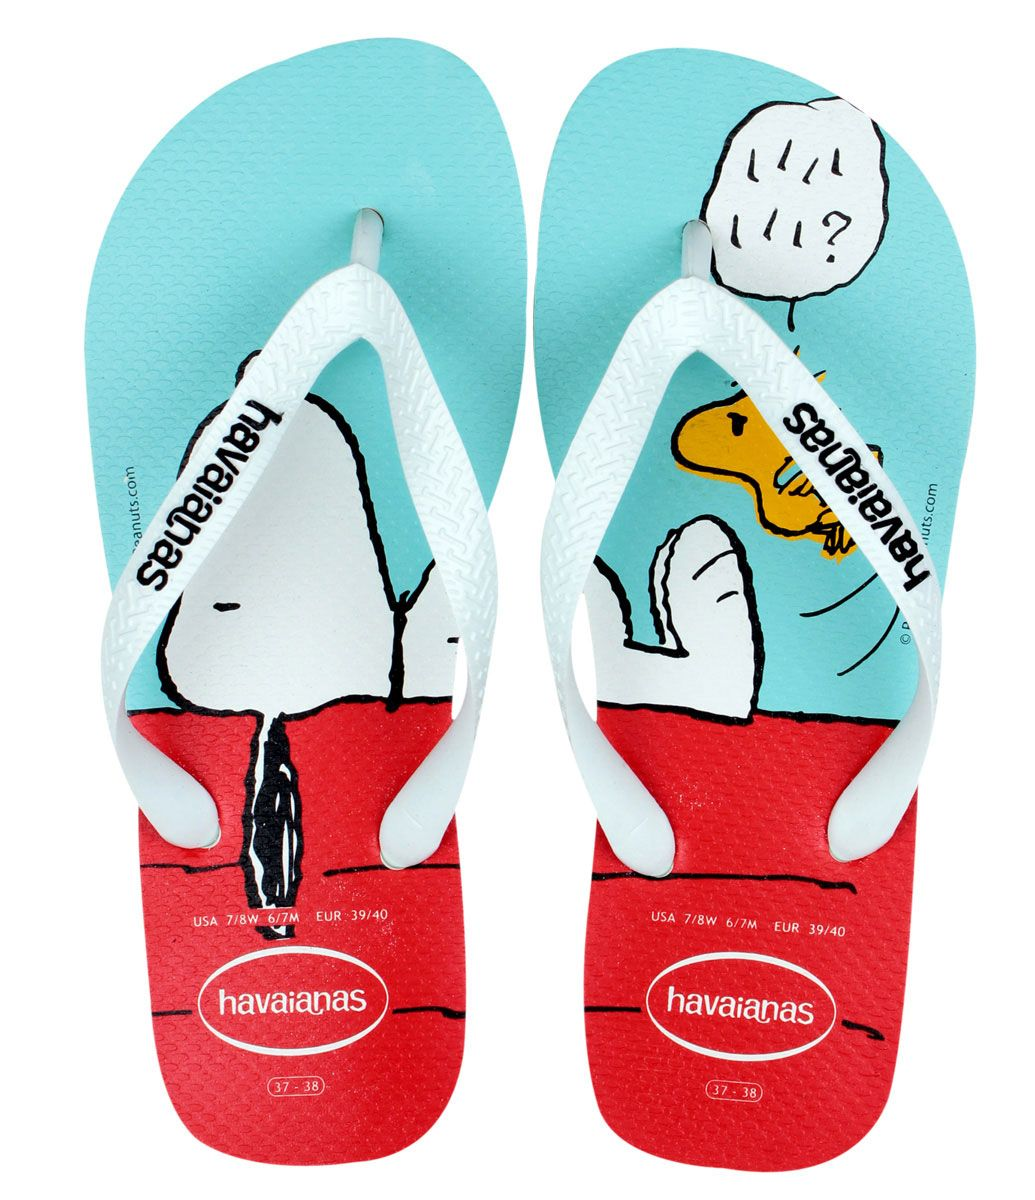 e014f295626 Chinelo Havaianas Feminino com Estampa Snoopy - Lojas Renner